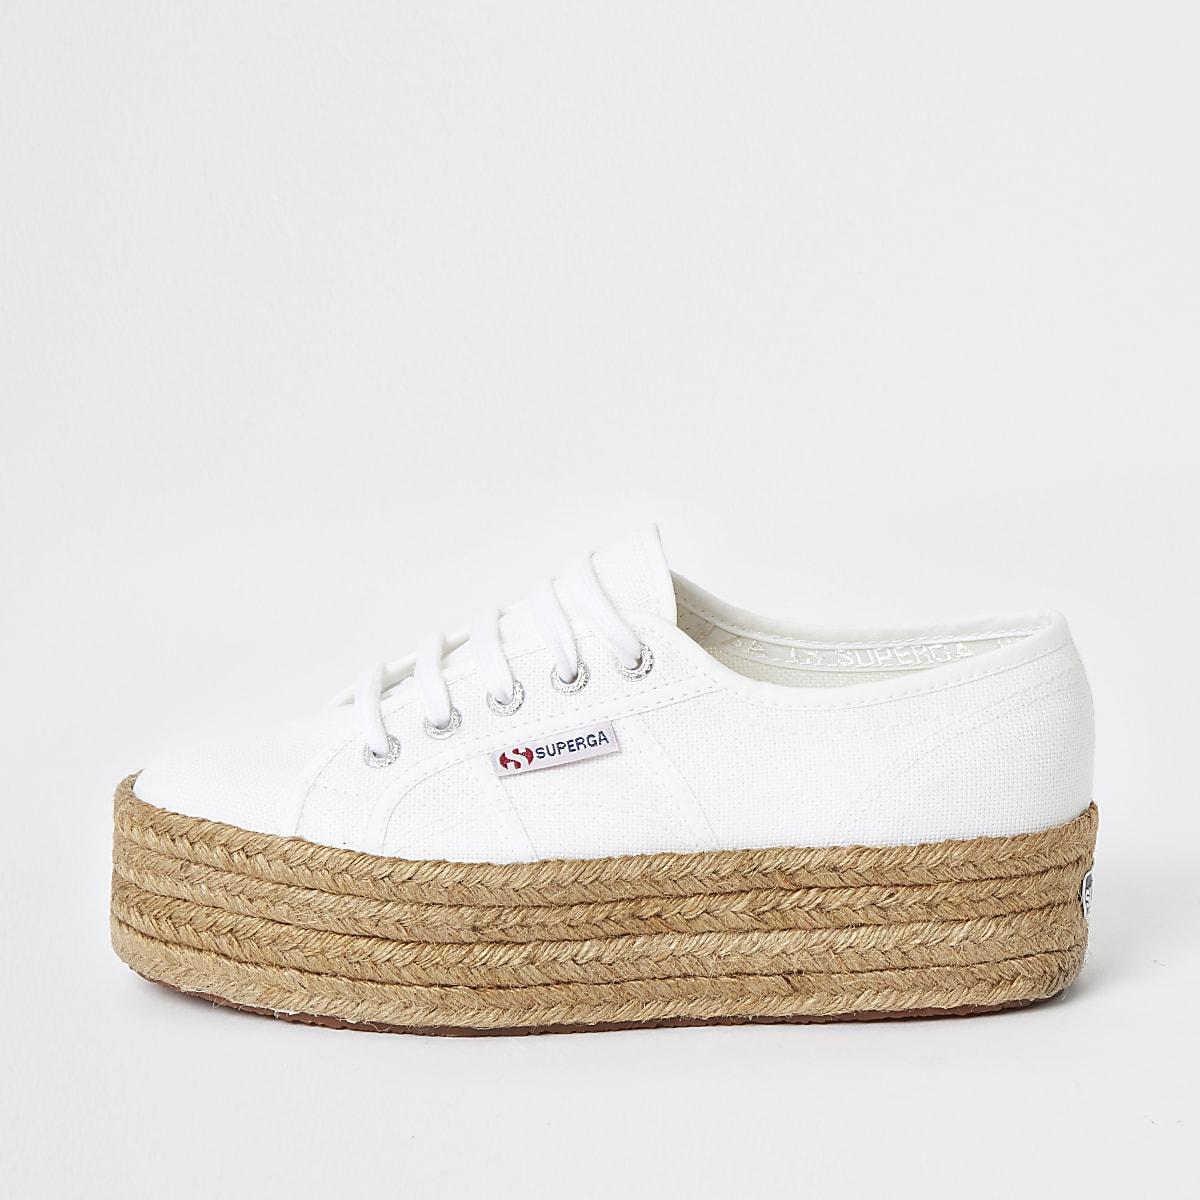 Superga – Baskets de course blanches façon espadrilles